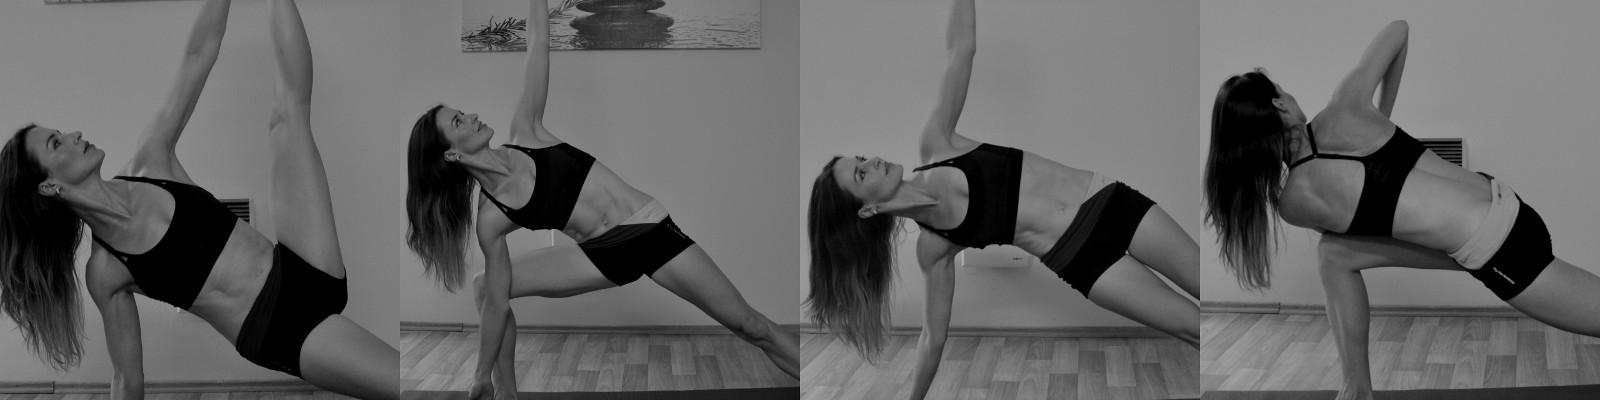 yoga20174